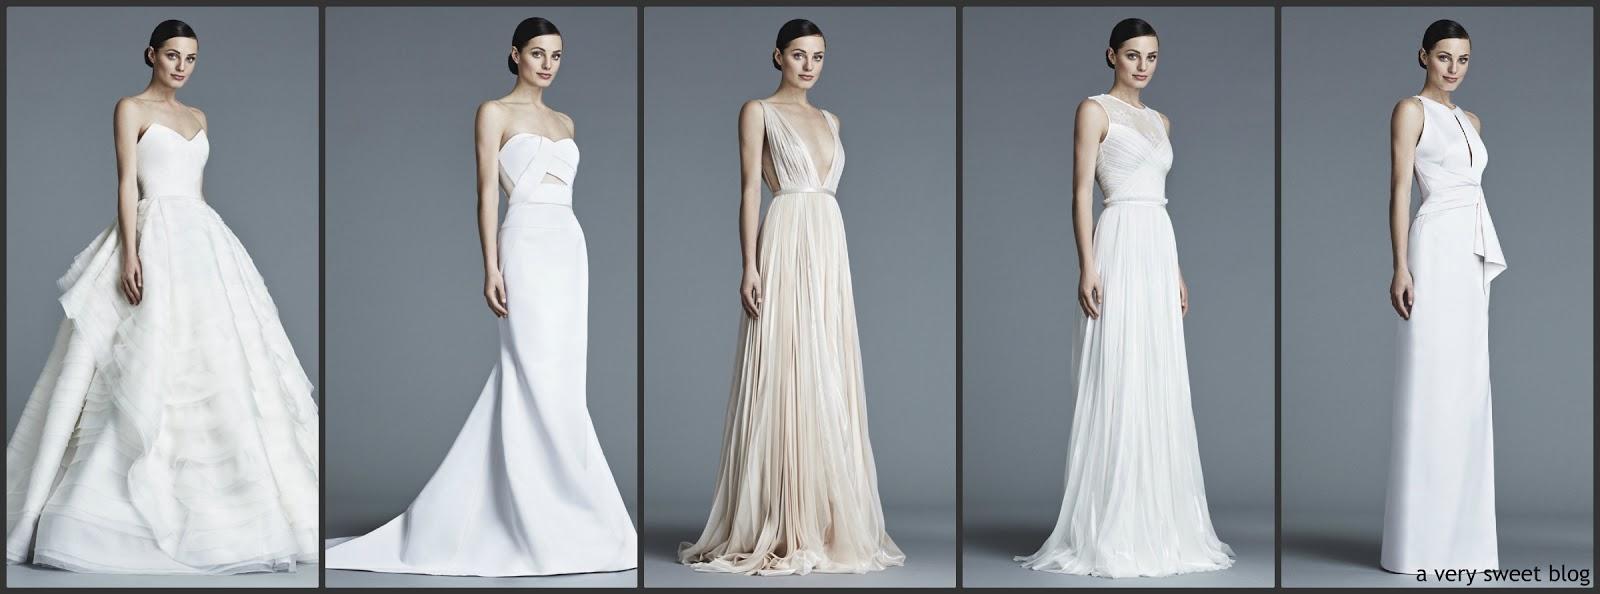 bridal j mendel wedding dress J Mendel Bridal